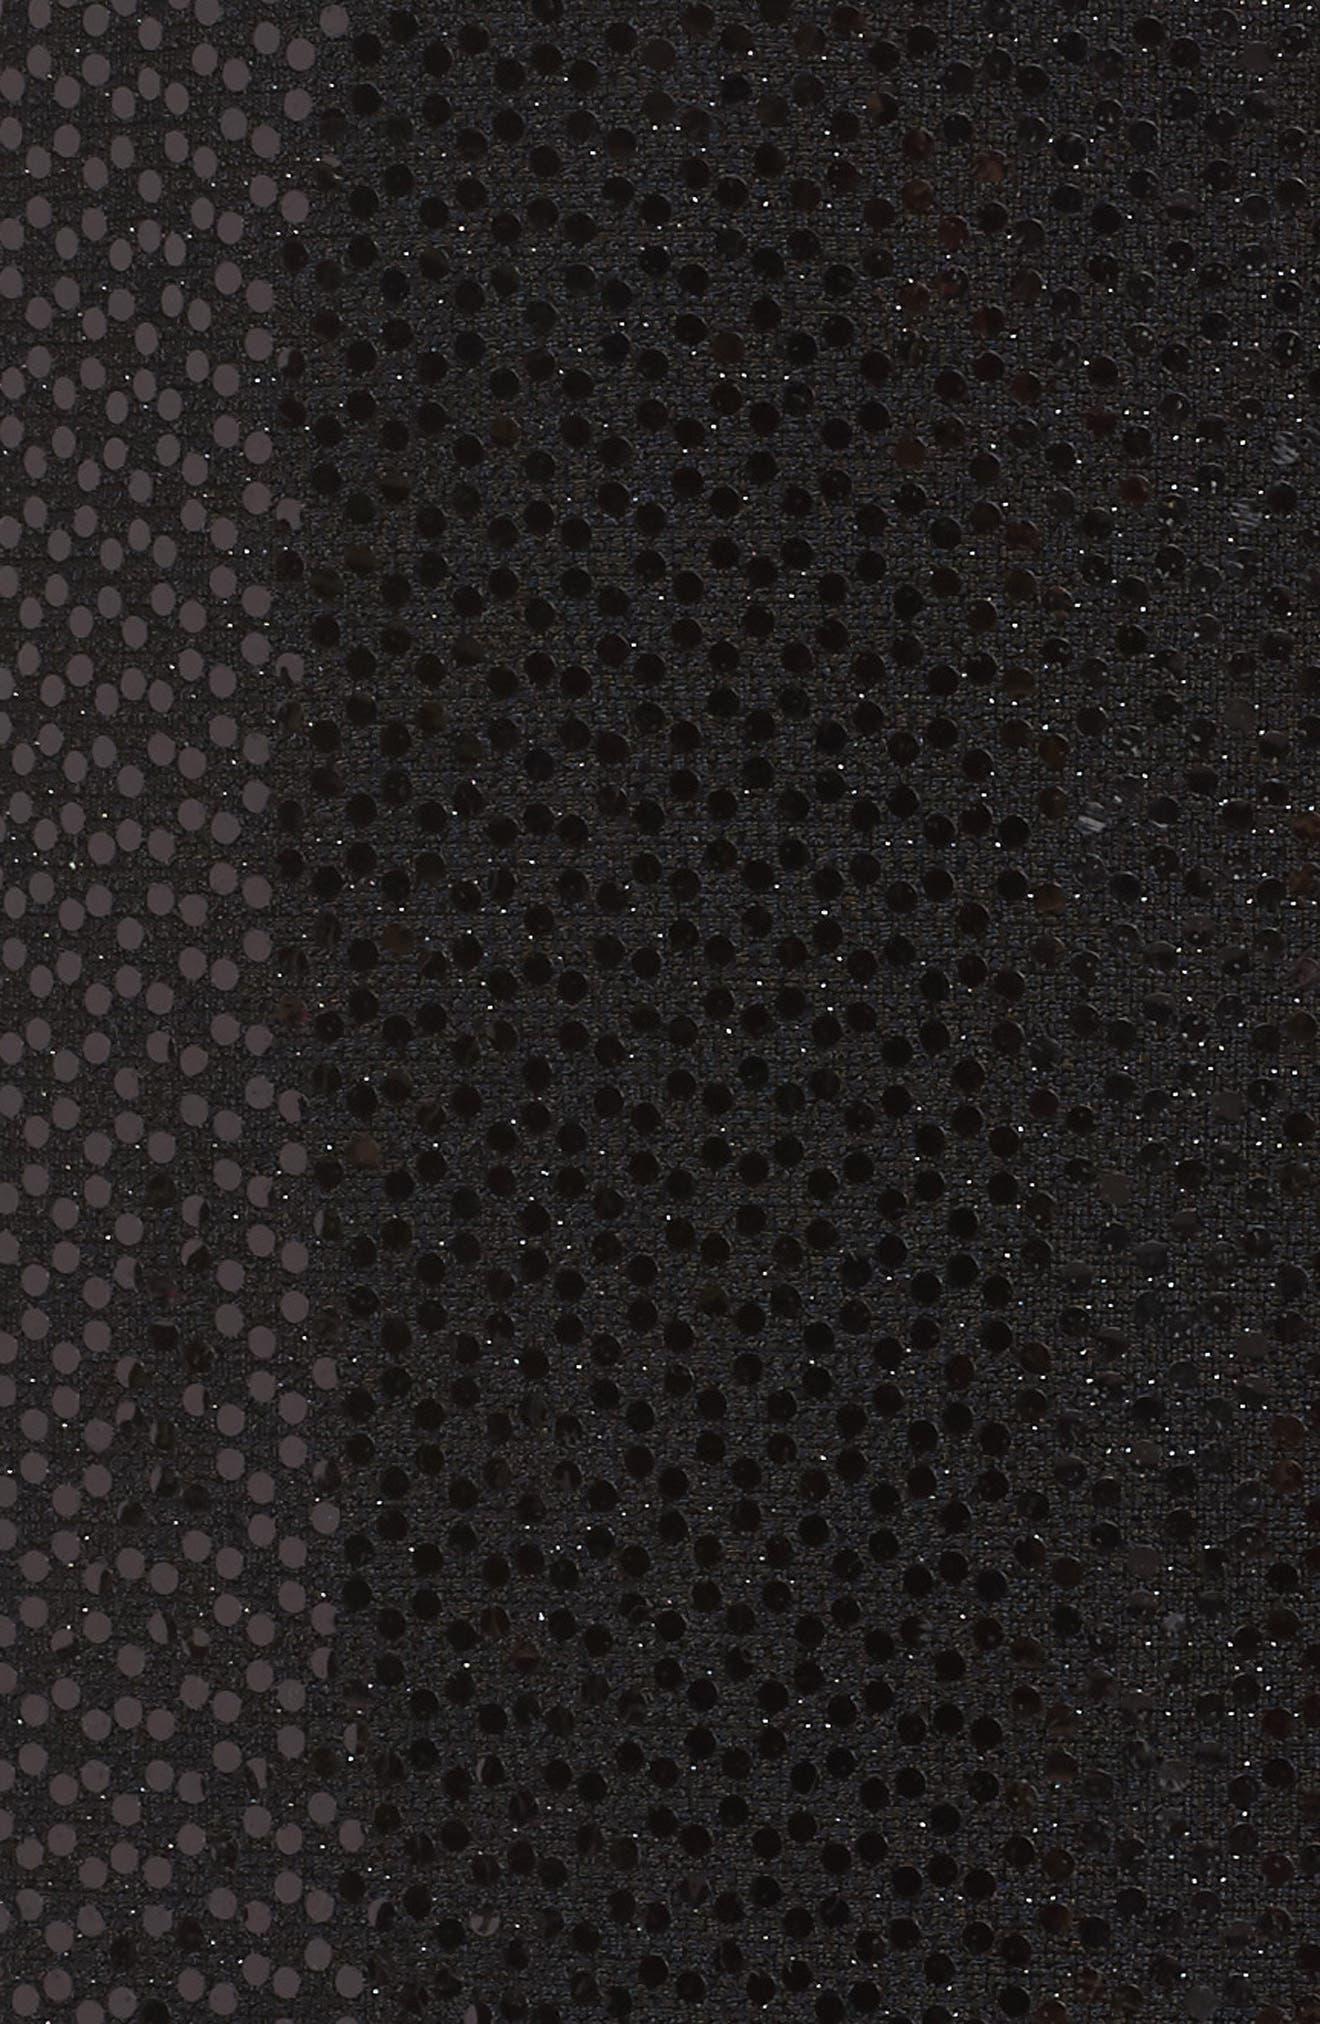 Sequin Knit Twinset,                             Alternate thumbnail 3, color,                             001